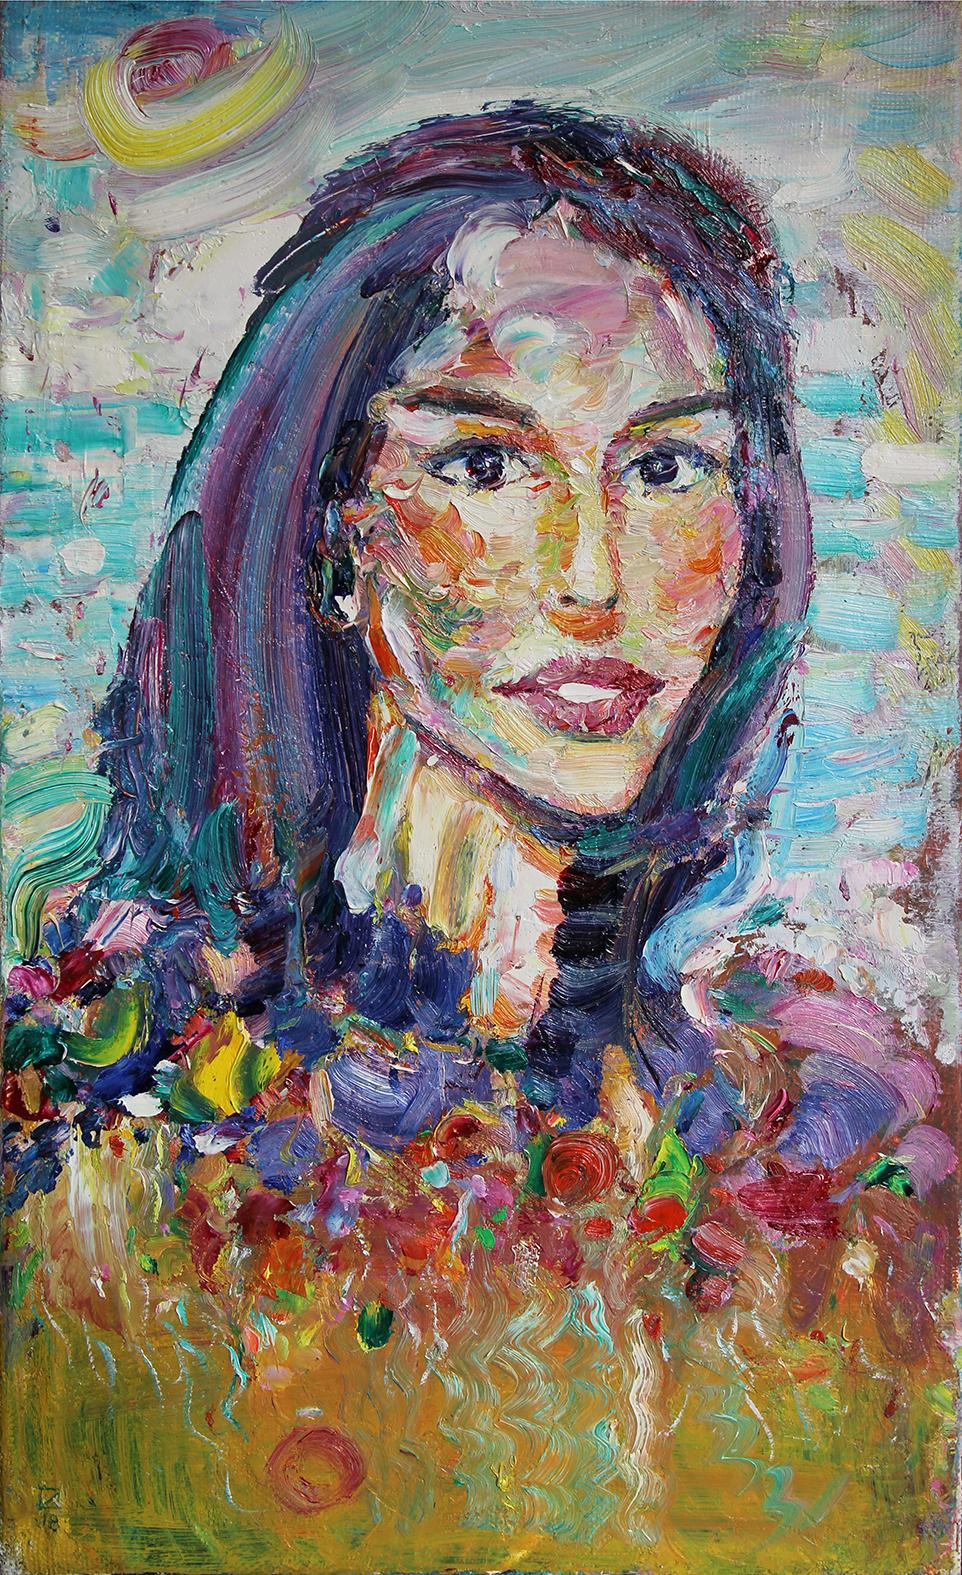 Portrait of Lena. 2019. Oil on canvas. 60,5 x 35